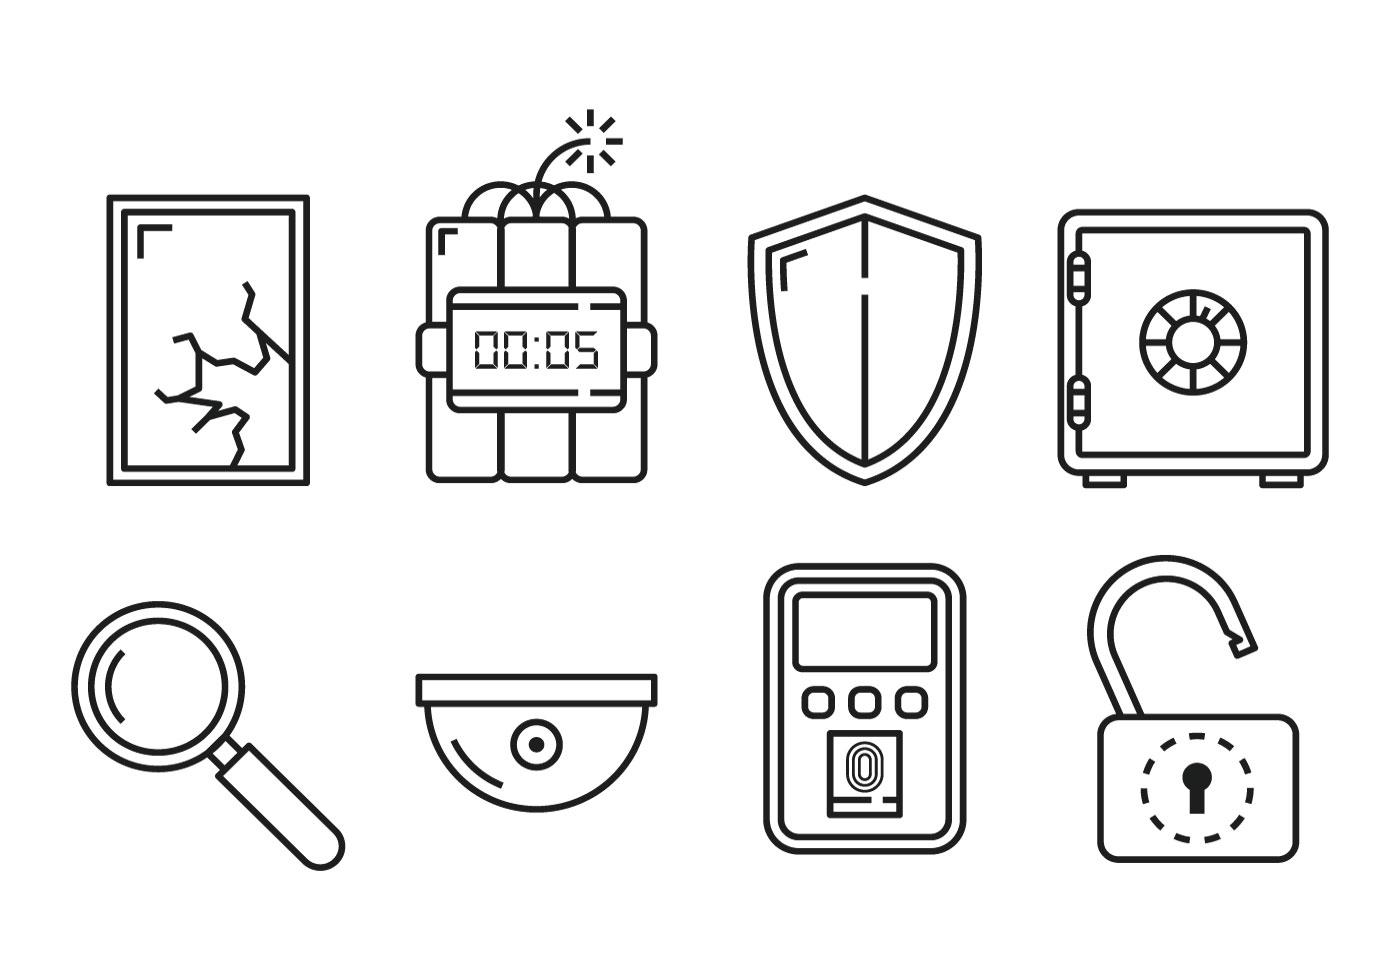 Security Linear Icon Vectors - Download Free Vector Art ...